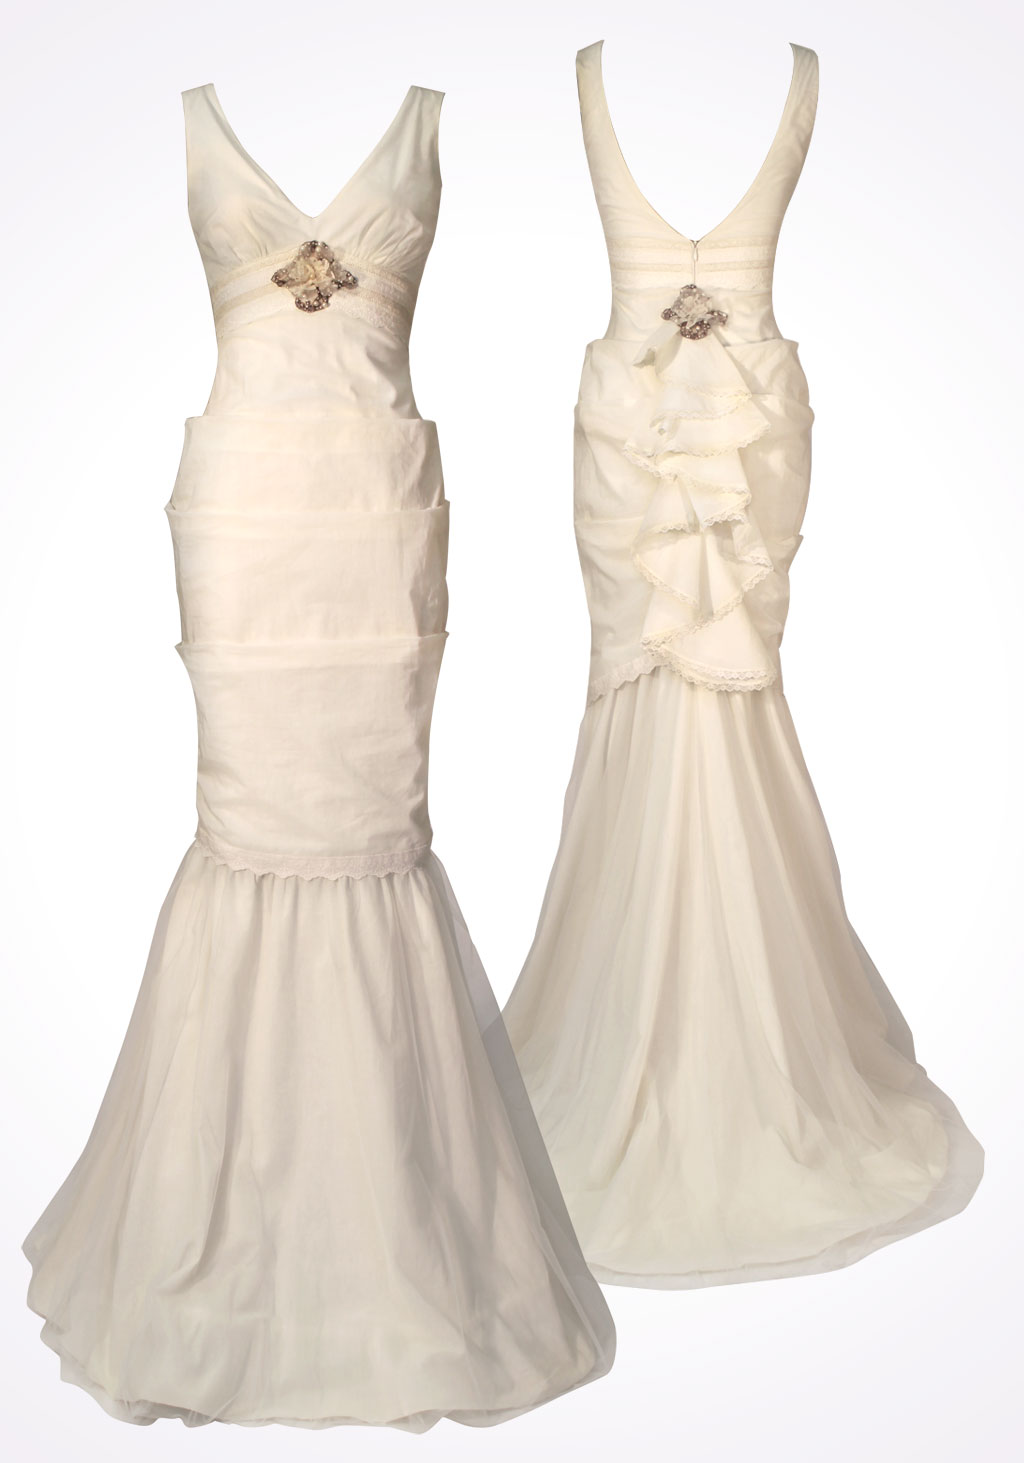 Claire Pettibone's Lydia Wedding Dress